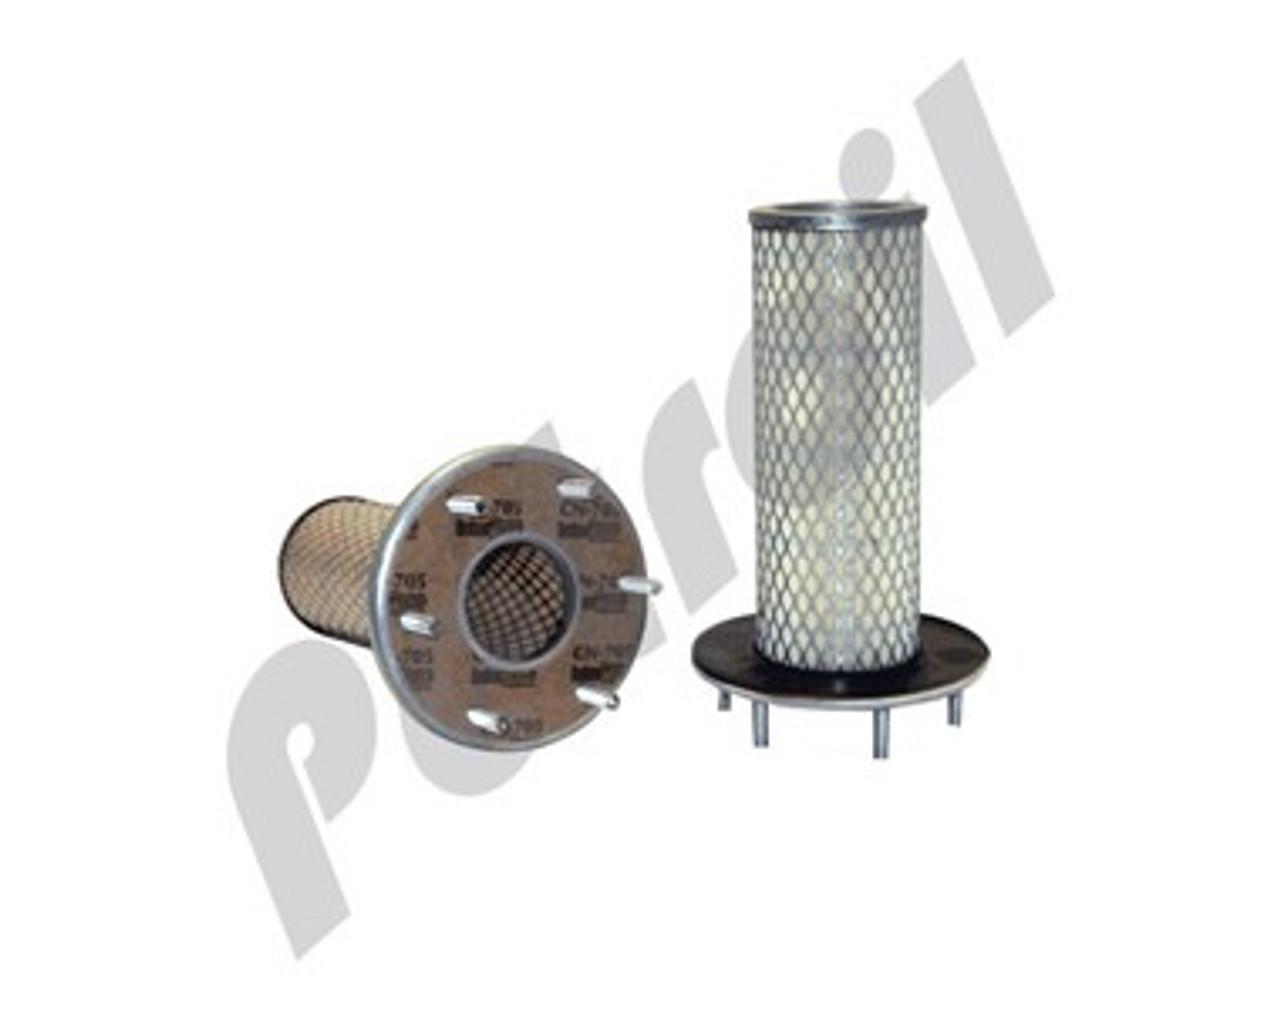 6-1//4 x 13-3//32 in. Baldwin Filters PA1675 Heavy Duty Air Filter